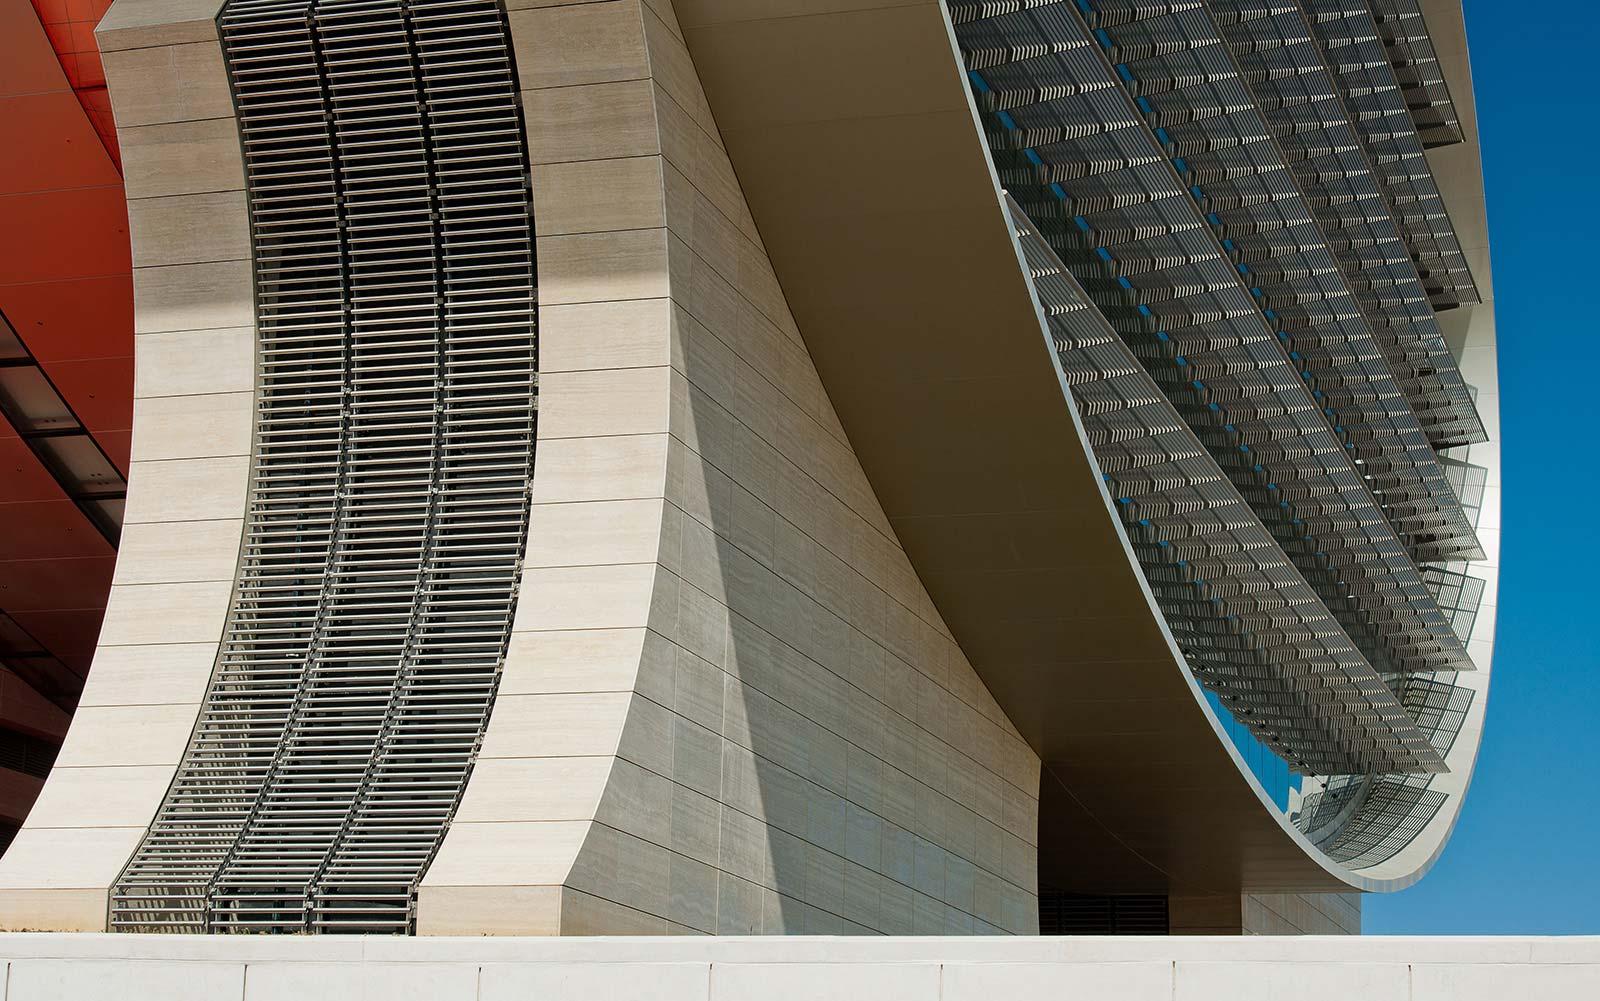 the-mauritius-commercial-bank-ebene-jean-francois-koenig-close-up-shading